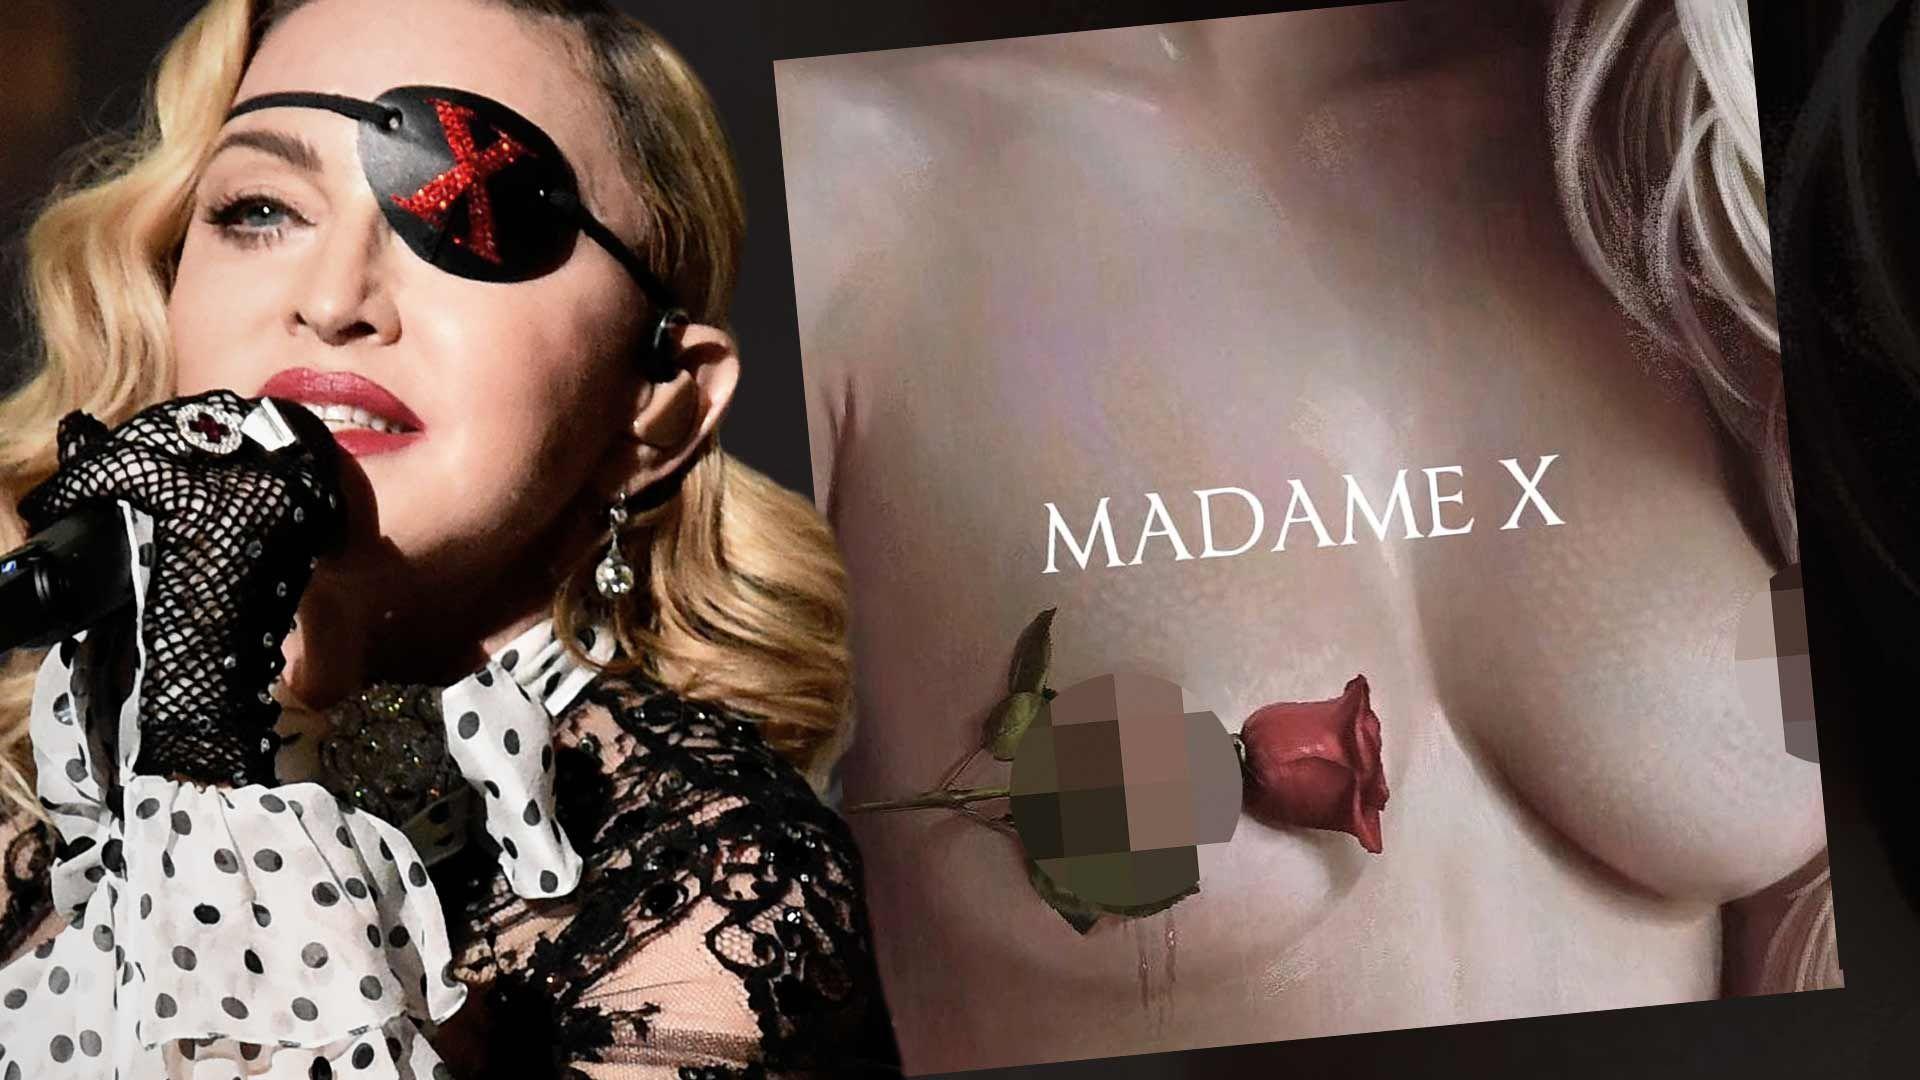 Madonna Shows Off Shocking NSFW Madame X Album Art